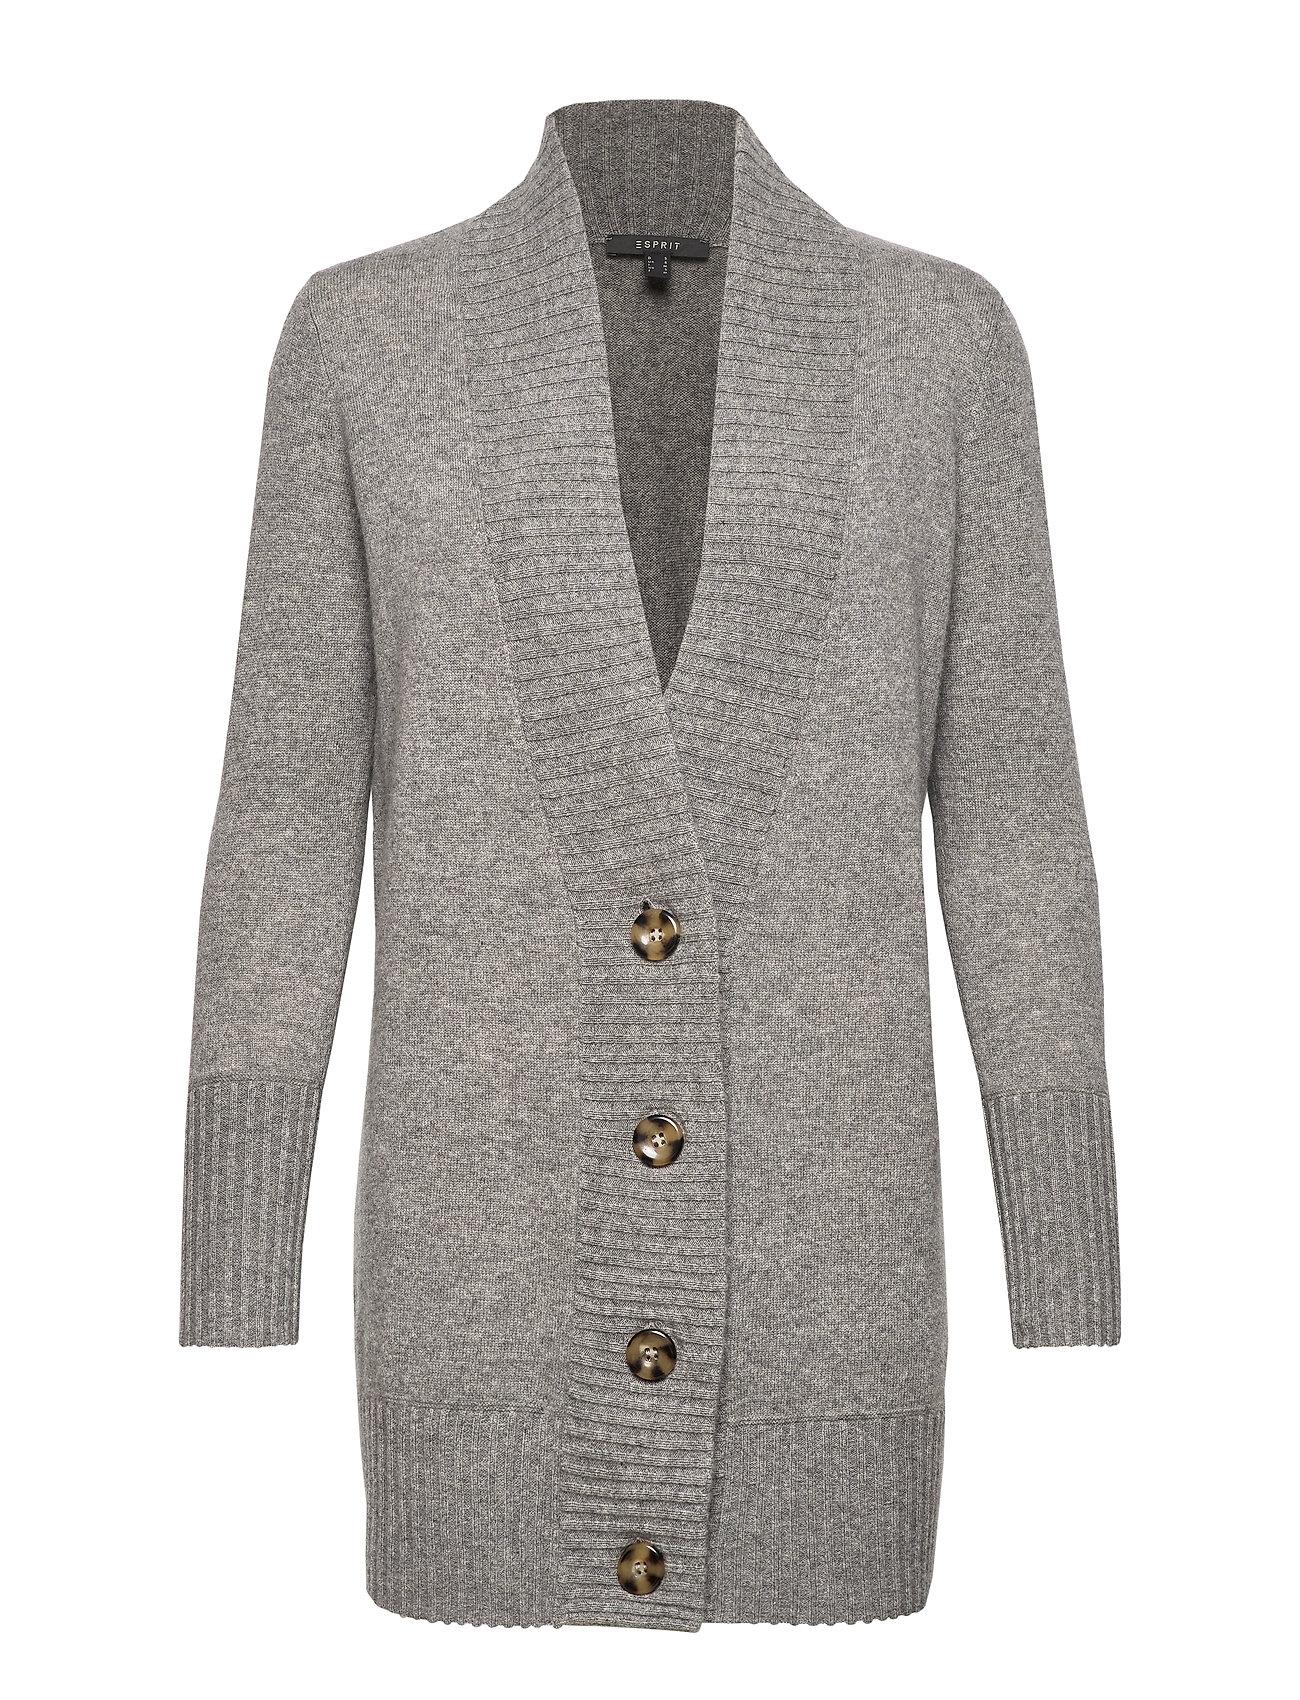 ESPRIT Sweaters Cardigan Cardigan Strickpullover Grau ESPRIT COLLECTION